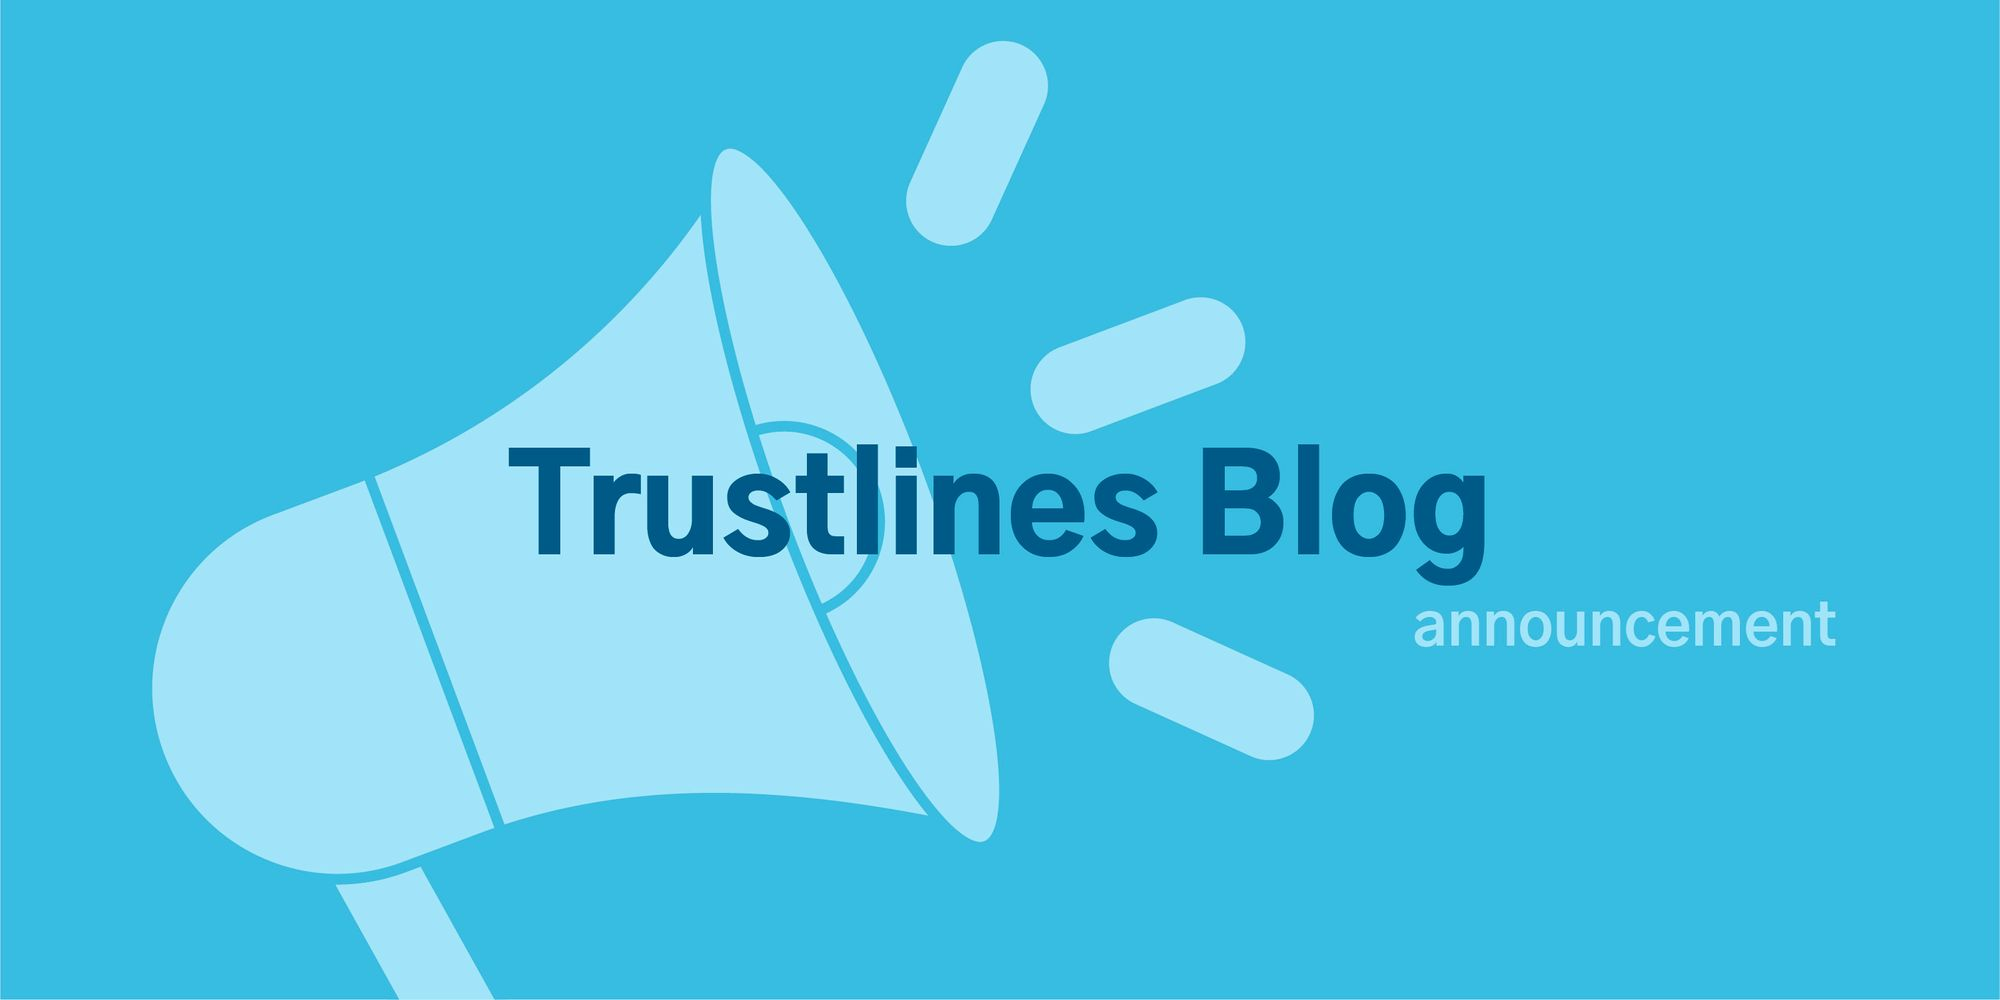 Announcing Trustlines Blog